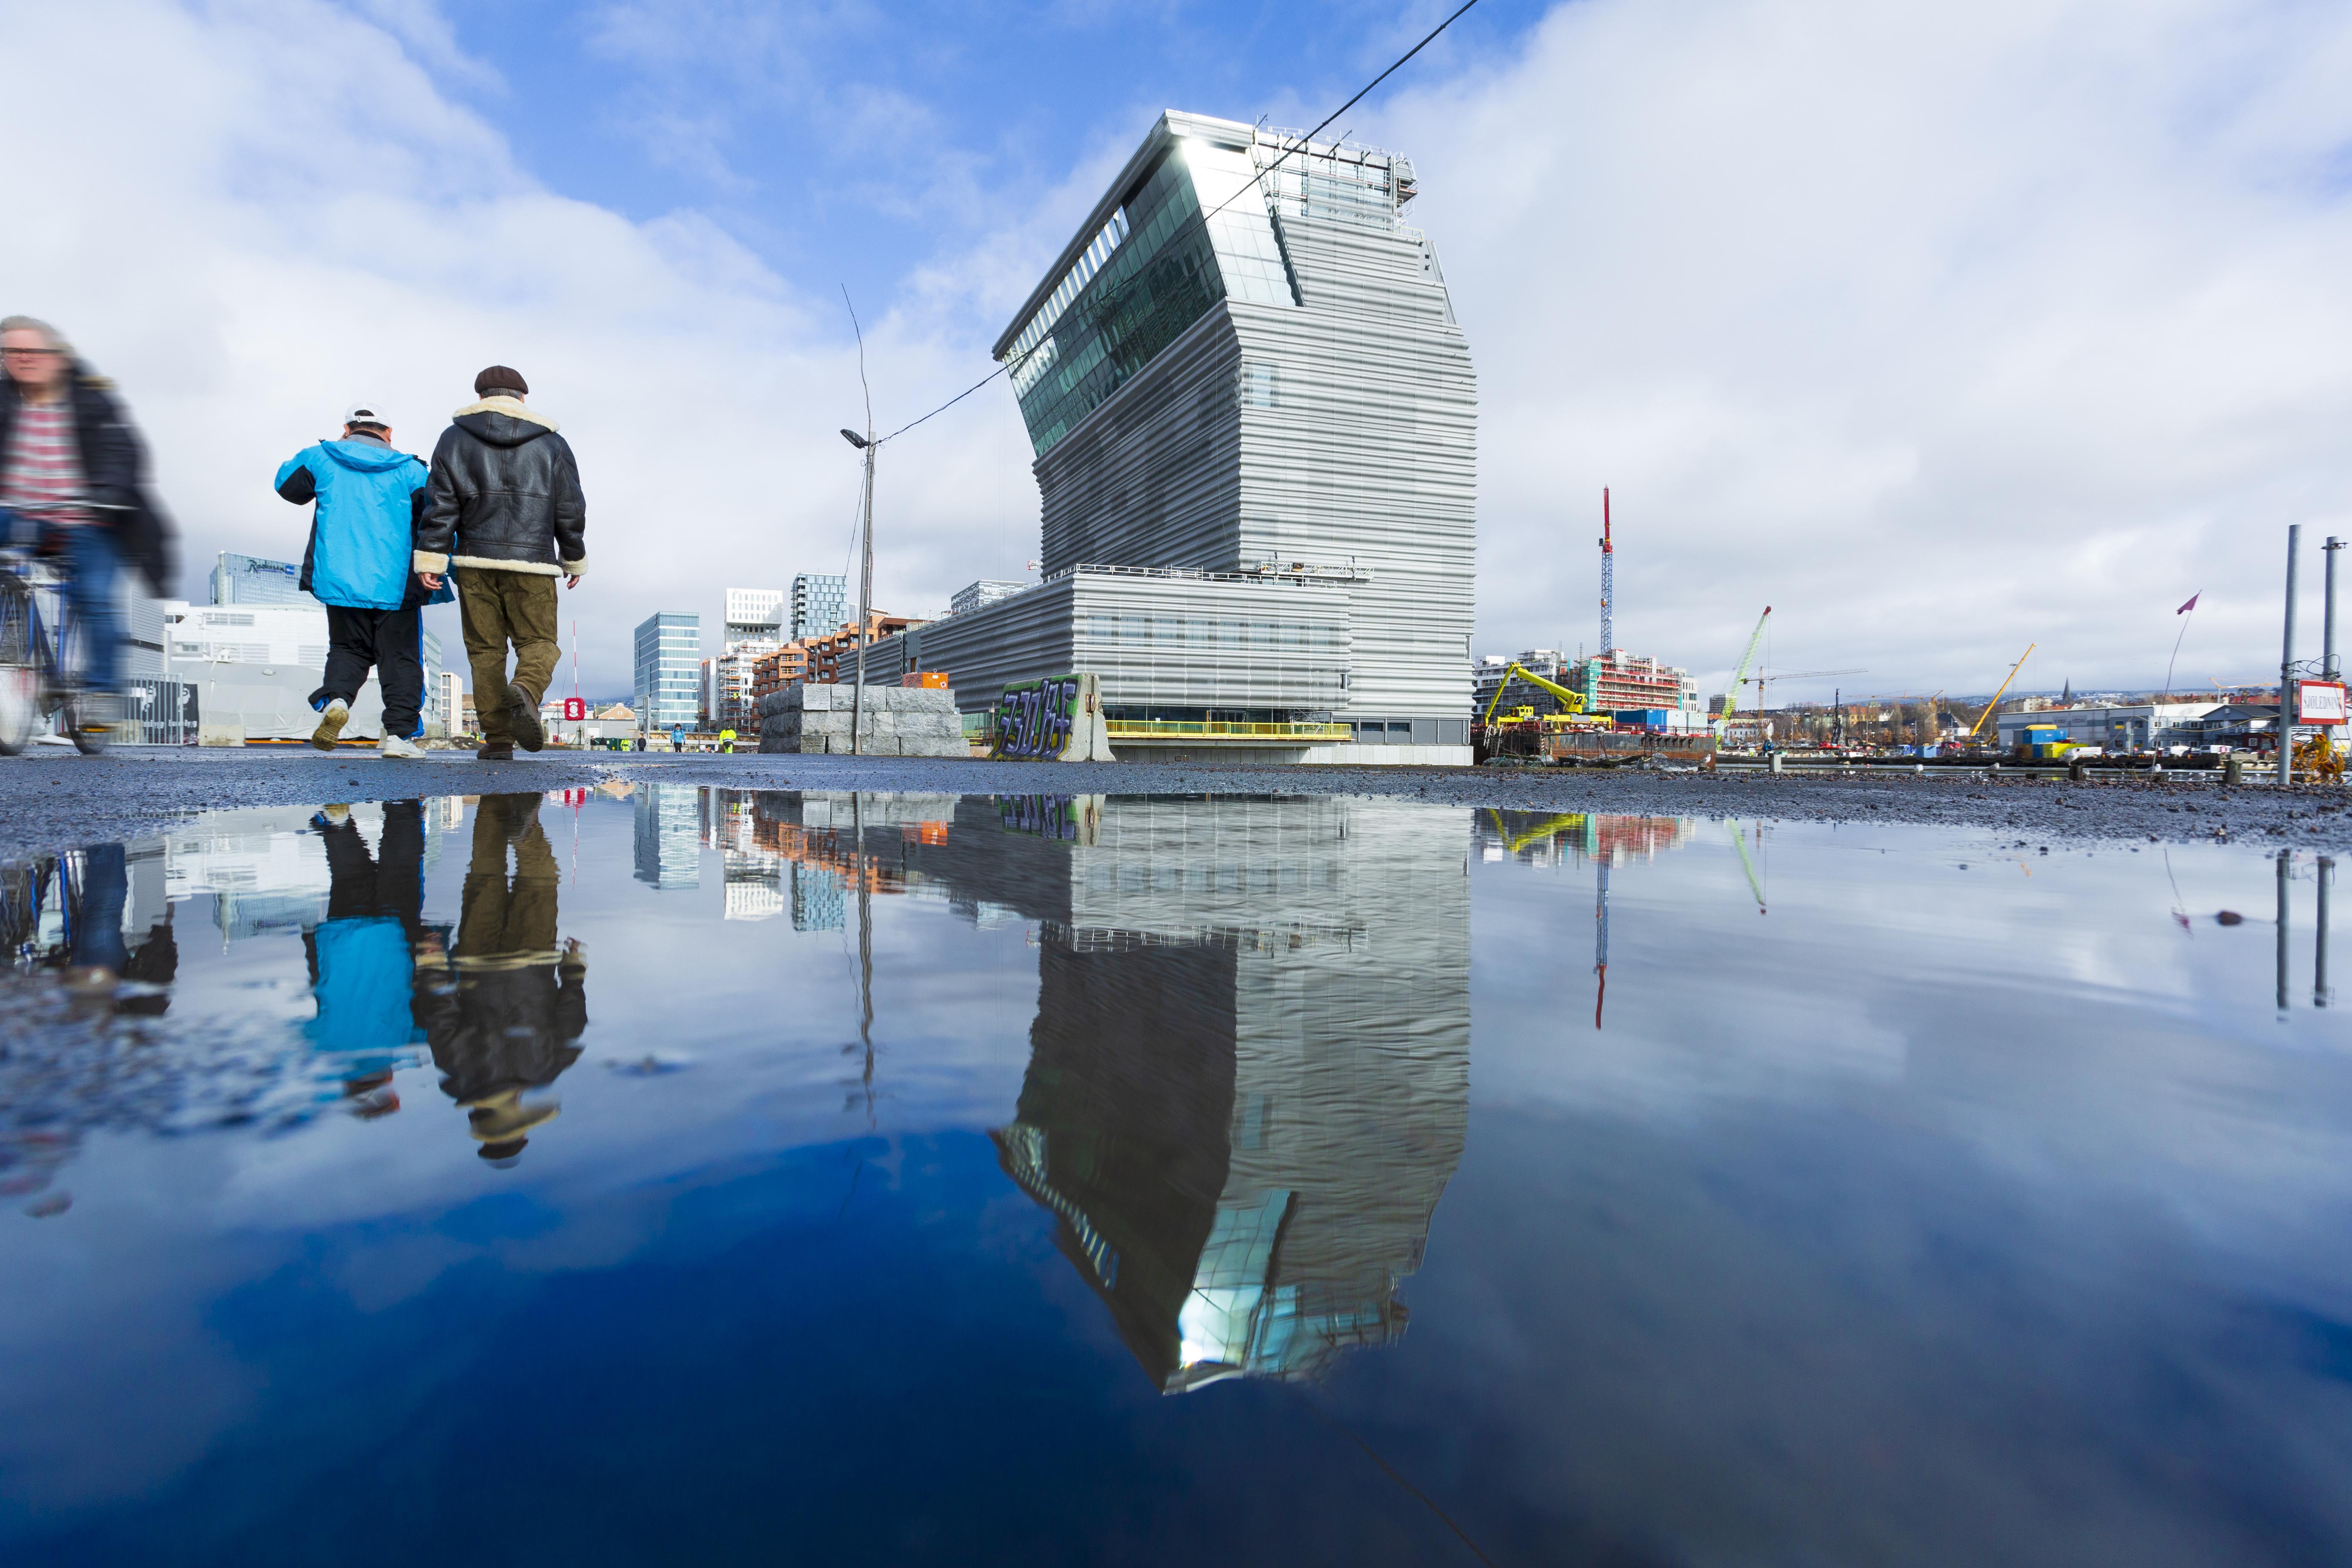 The Munch Museum in Oslo. Photo: VisitOSLO/Didrick Stenersen